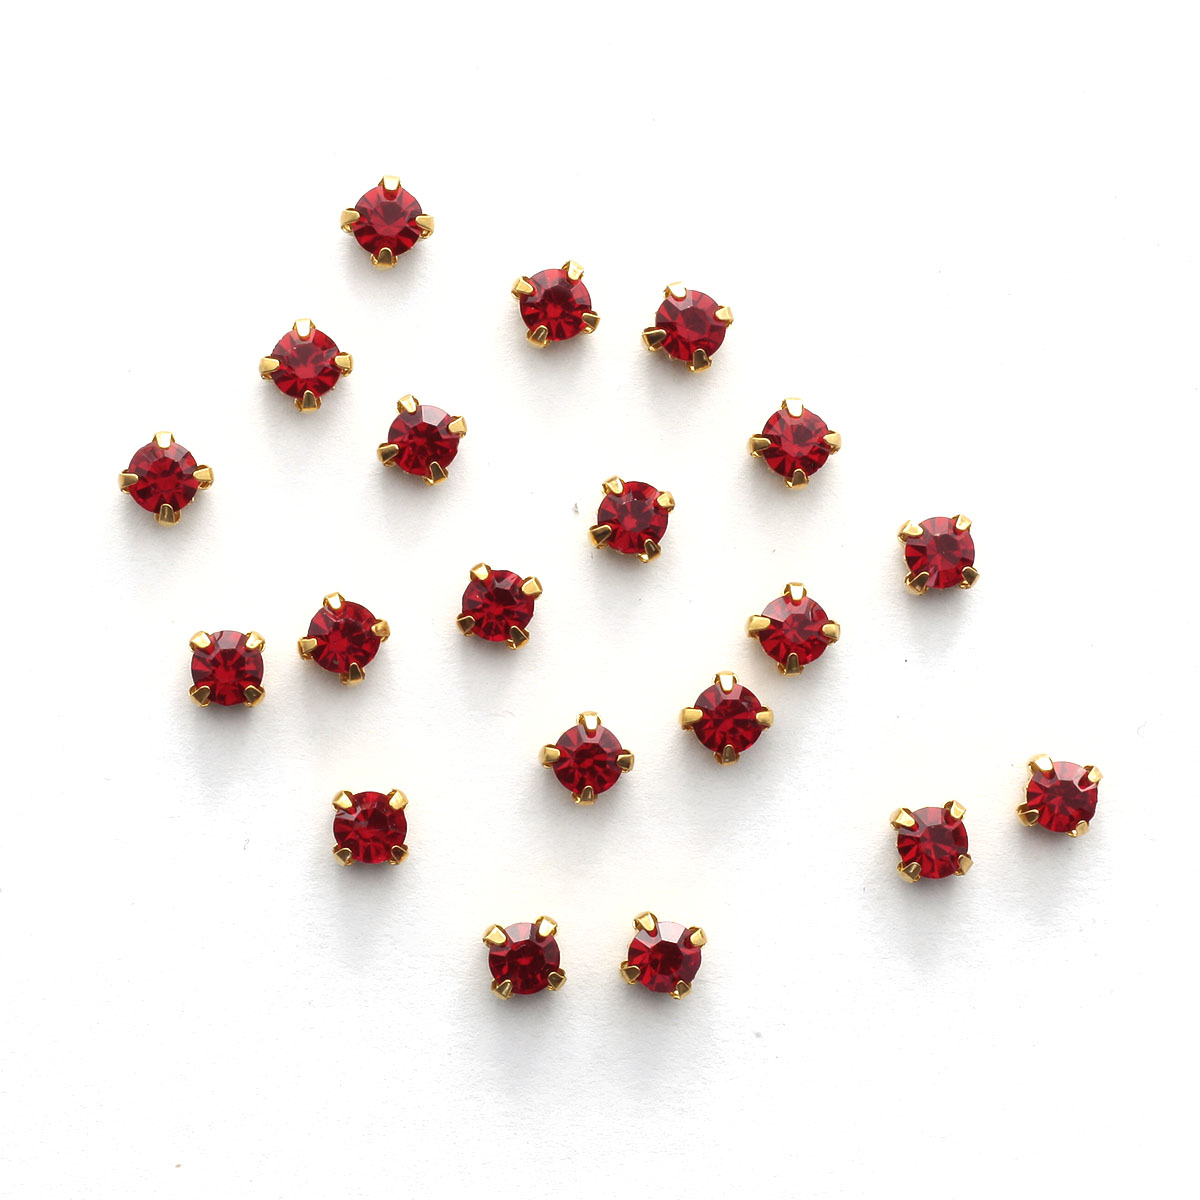 ЗЦ012НН66 Хрустальные стразы в цапах круглые (золото) красный 6*6мм, 20шт/упак Астра